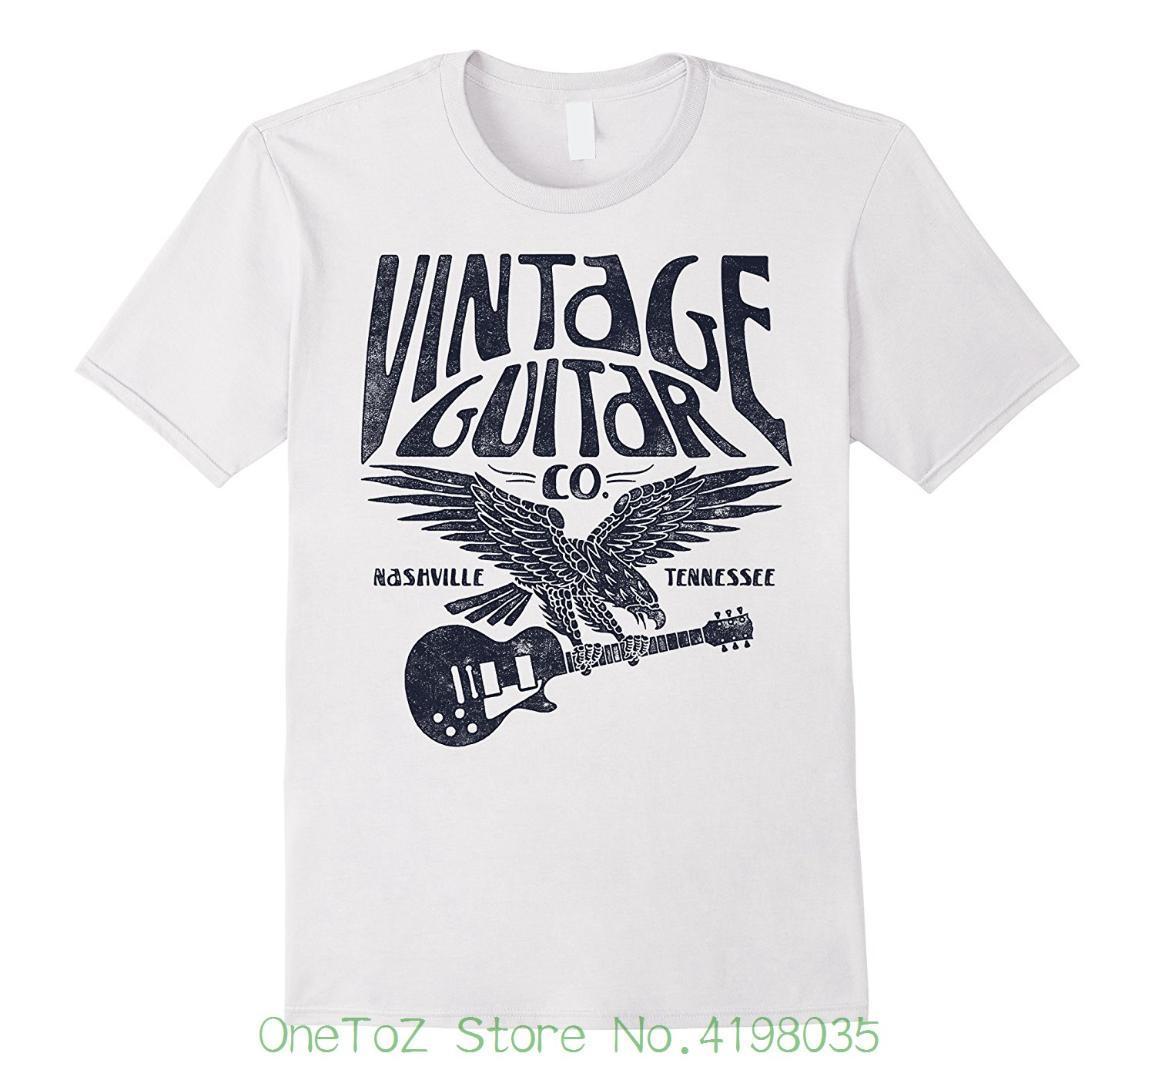 88d1dbc4fb6 Vintage Guitar Company Nashville Tennessee Eagle T Shirt Pride Of ...